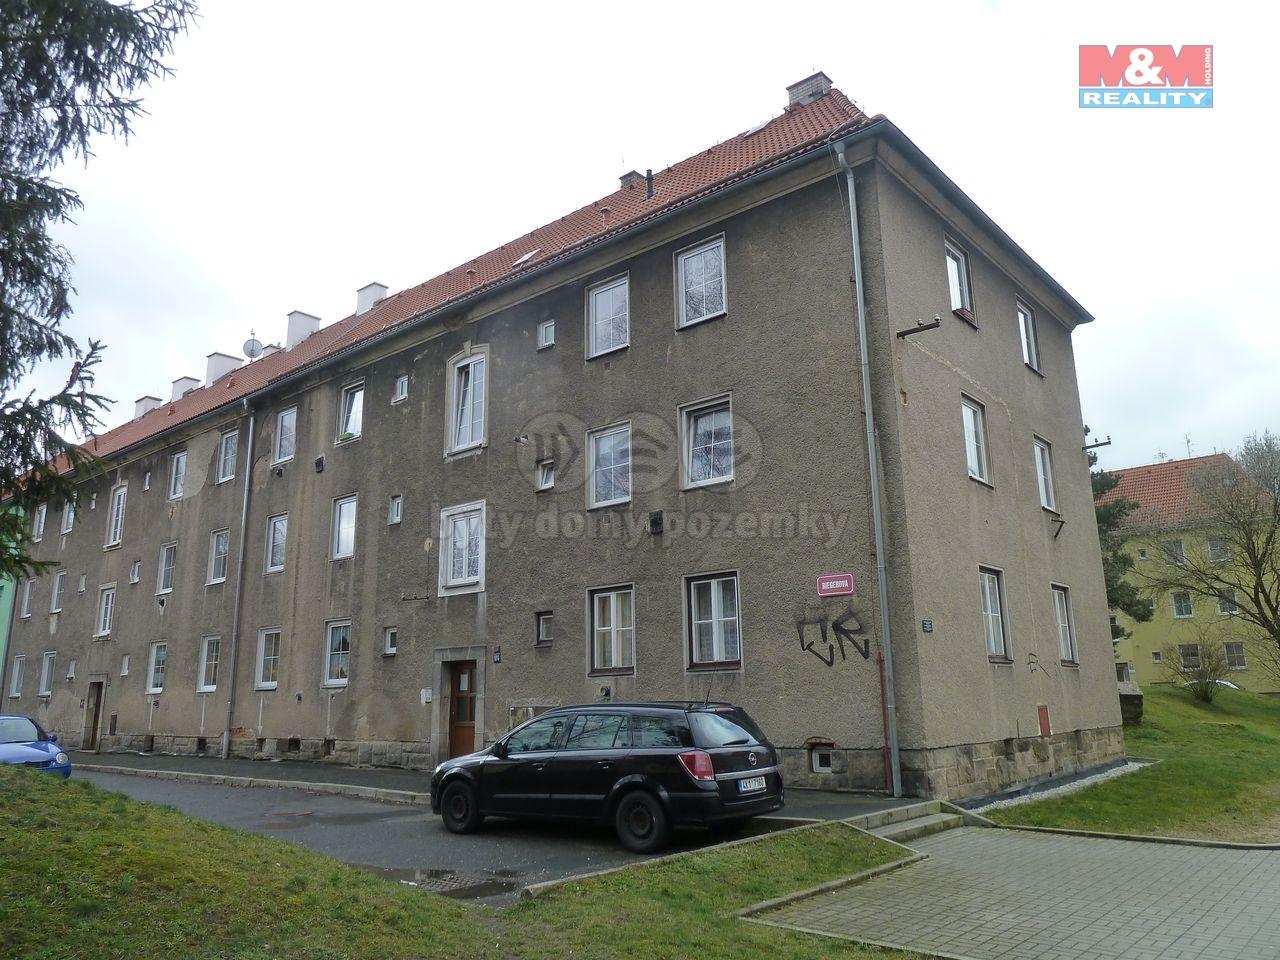 Prodej, byt 2+1, 53 m2, Cheb, ul. Riegerova